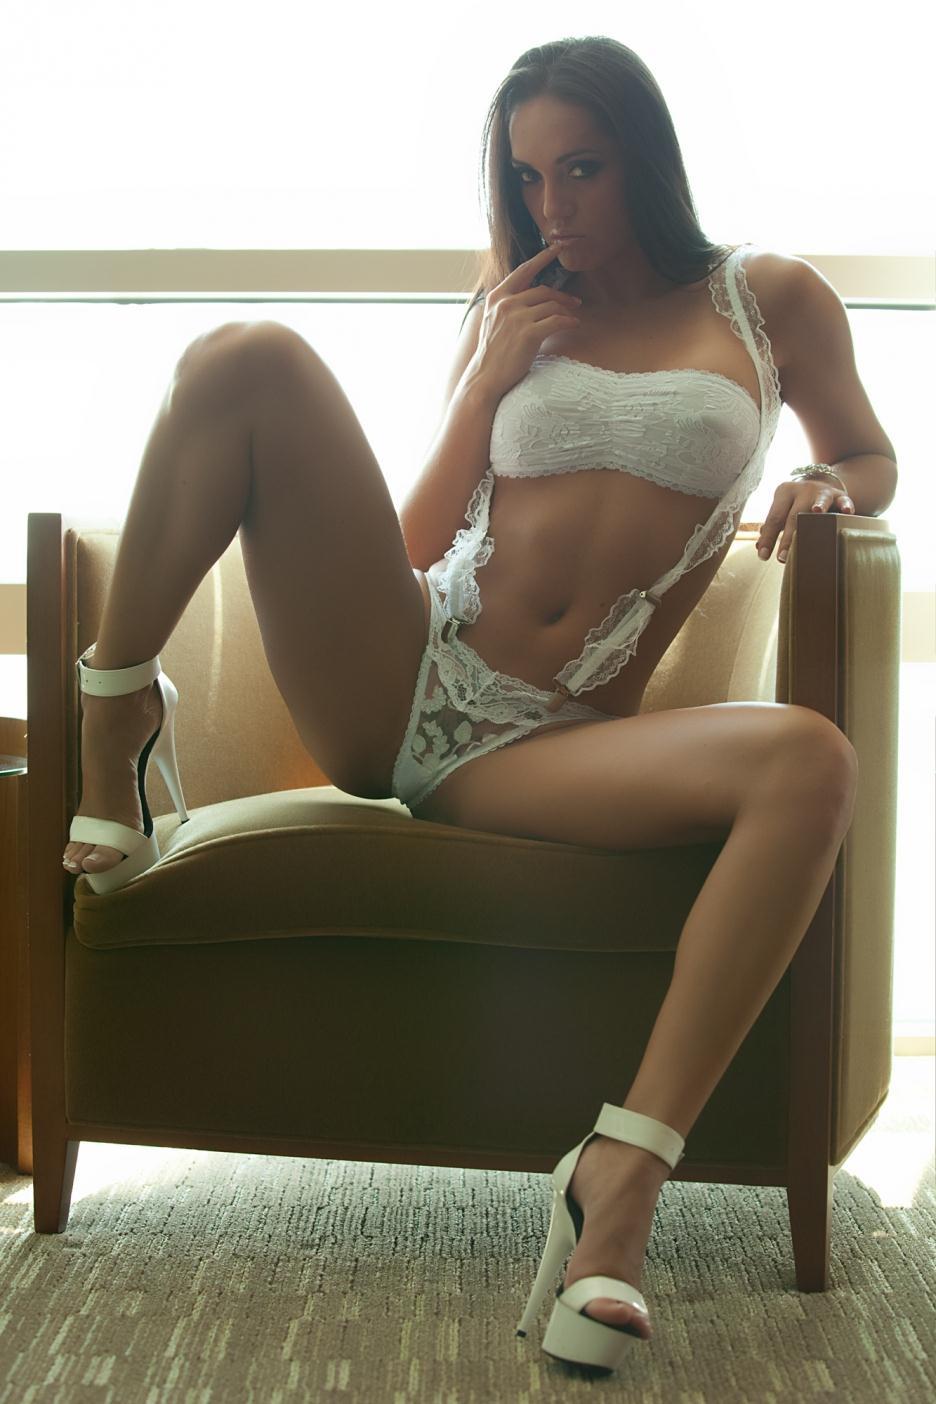 Tahiti Cora in lingerie